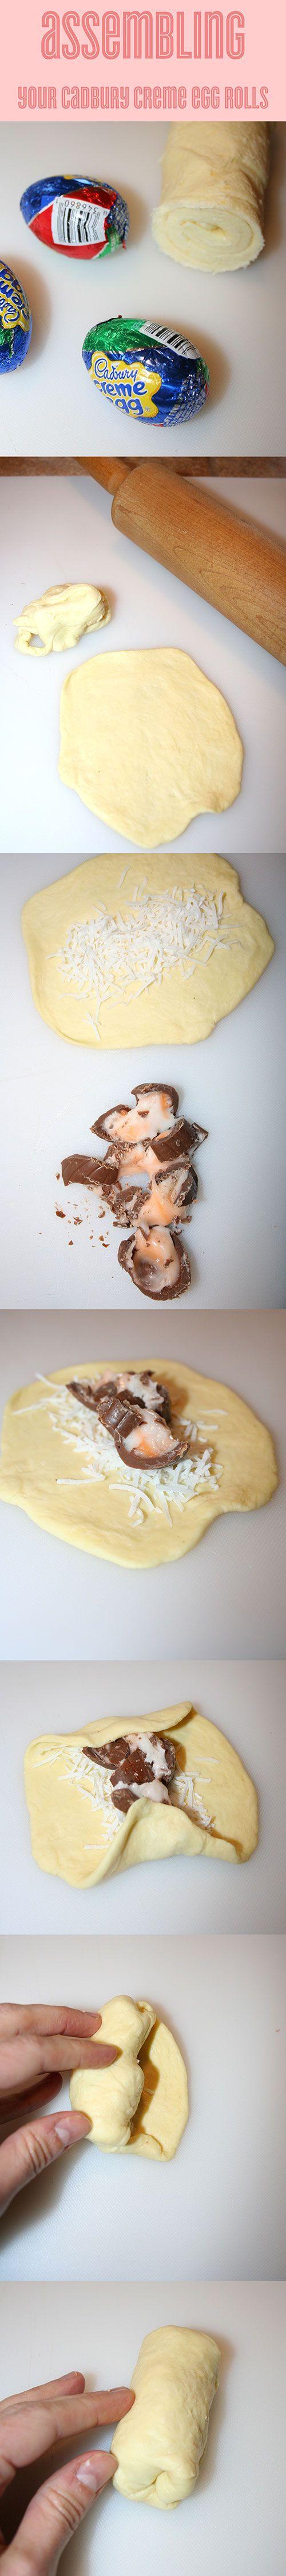 How to make Cadbury Creme Egg Rolls